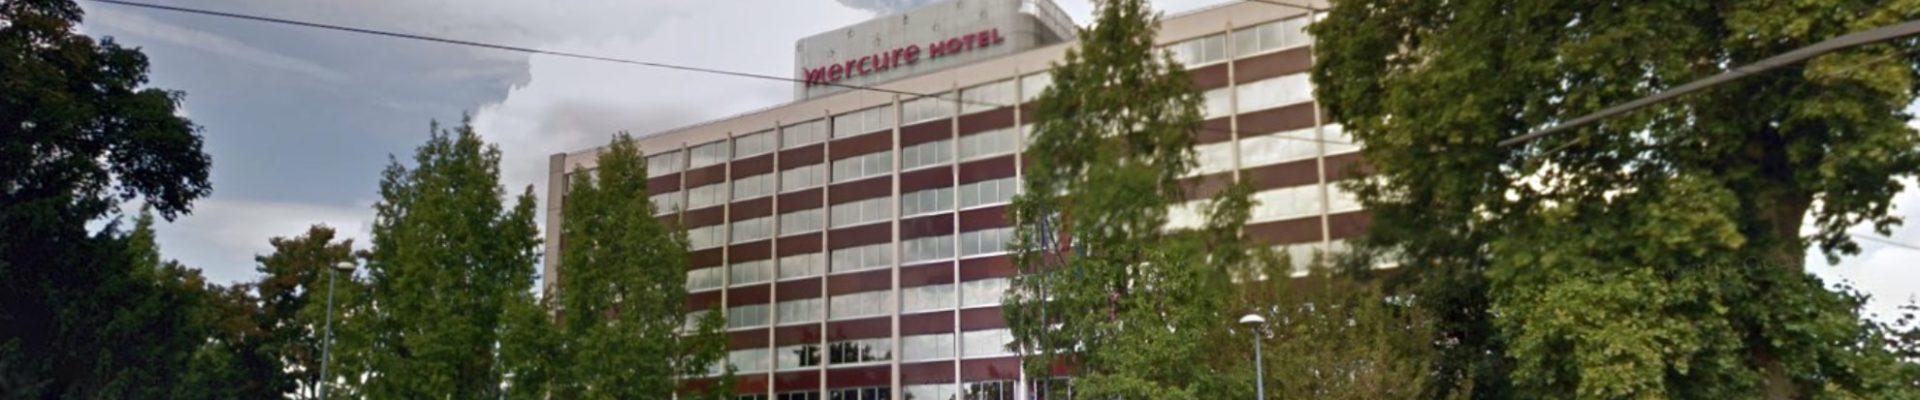 L'hôtel Mercure bientôt vendu